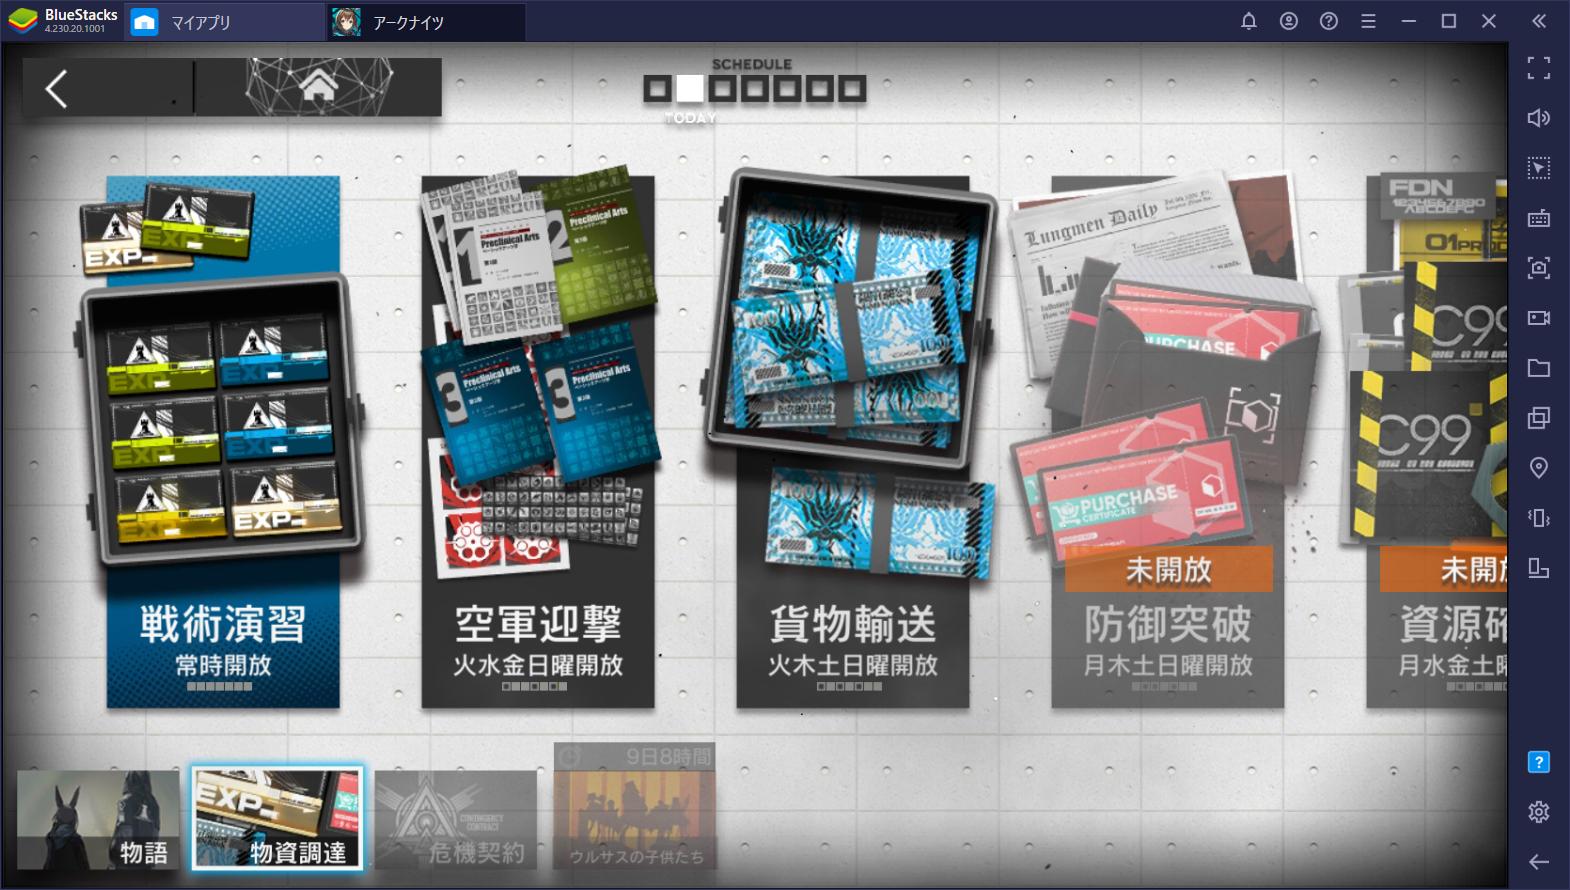 BlueStacks:『アークナイツ』初心者ガイド